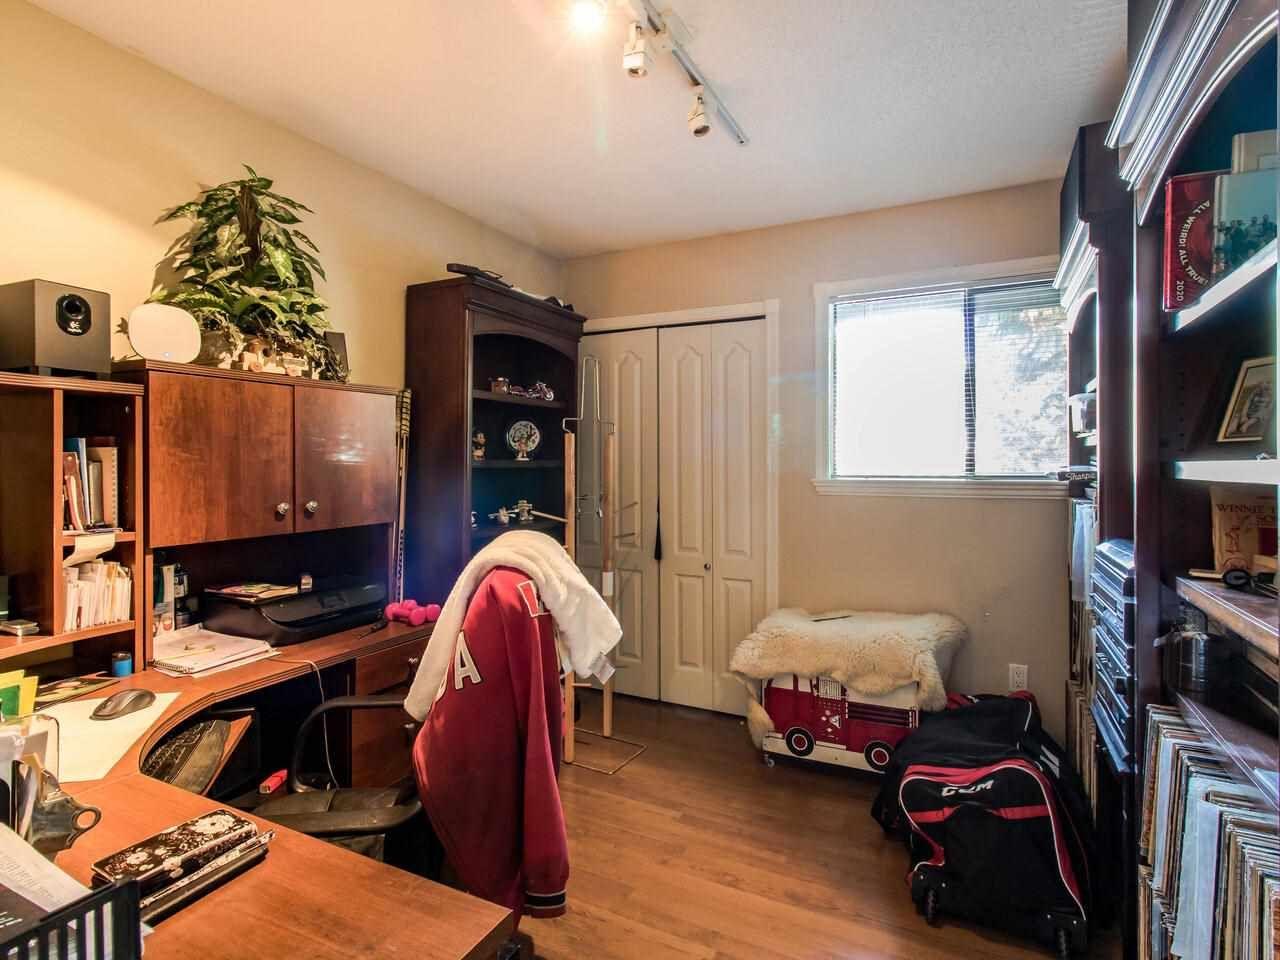 Photo 12: Photos: 11505 PEMBERTON Crescent in Delta: Annieville House for sale (N. Delta)  : MLS®# R2512135